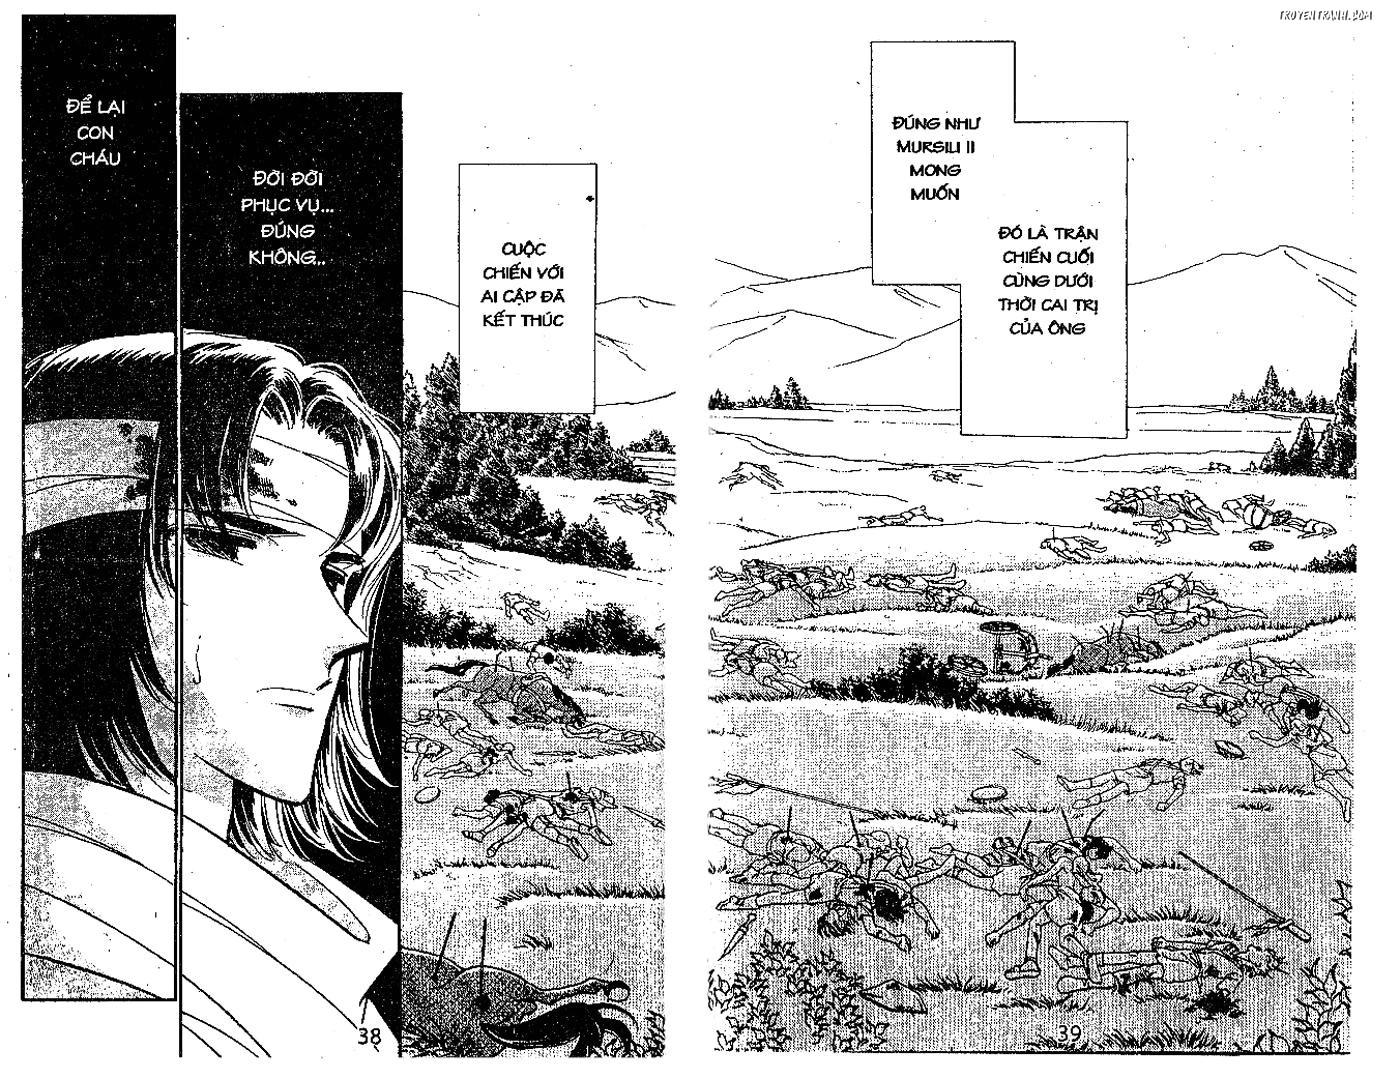 Sora wa Akai Kawa no Hotori - Dòng sông huyền bí Chapter 74 - Trang 34